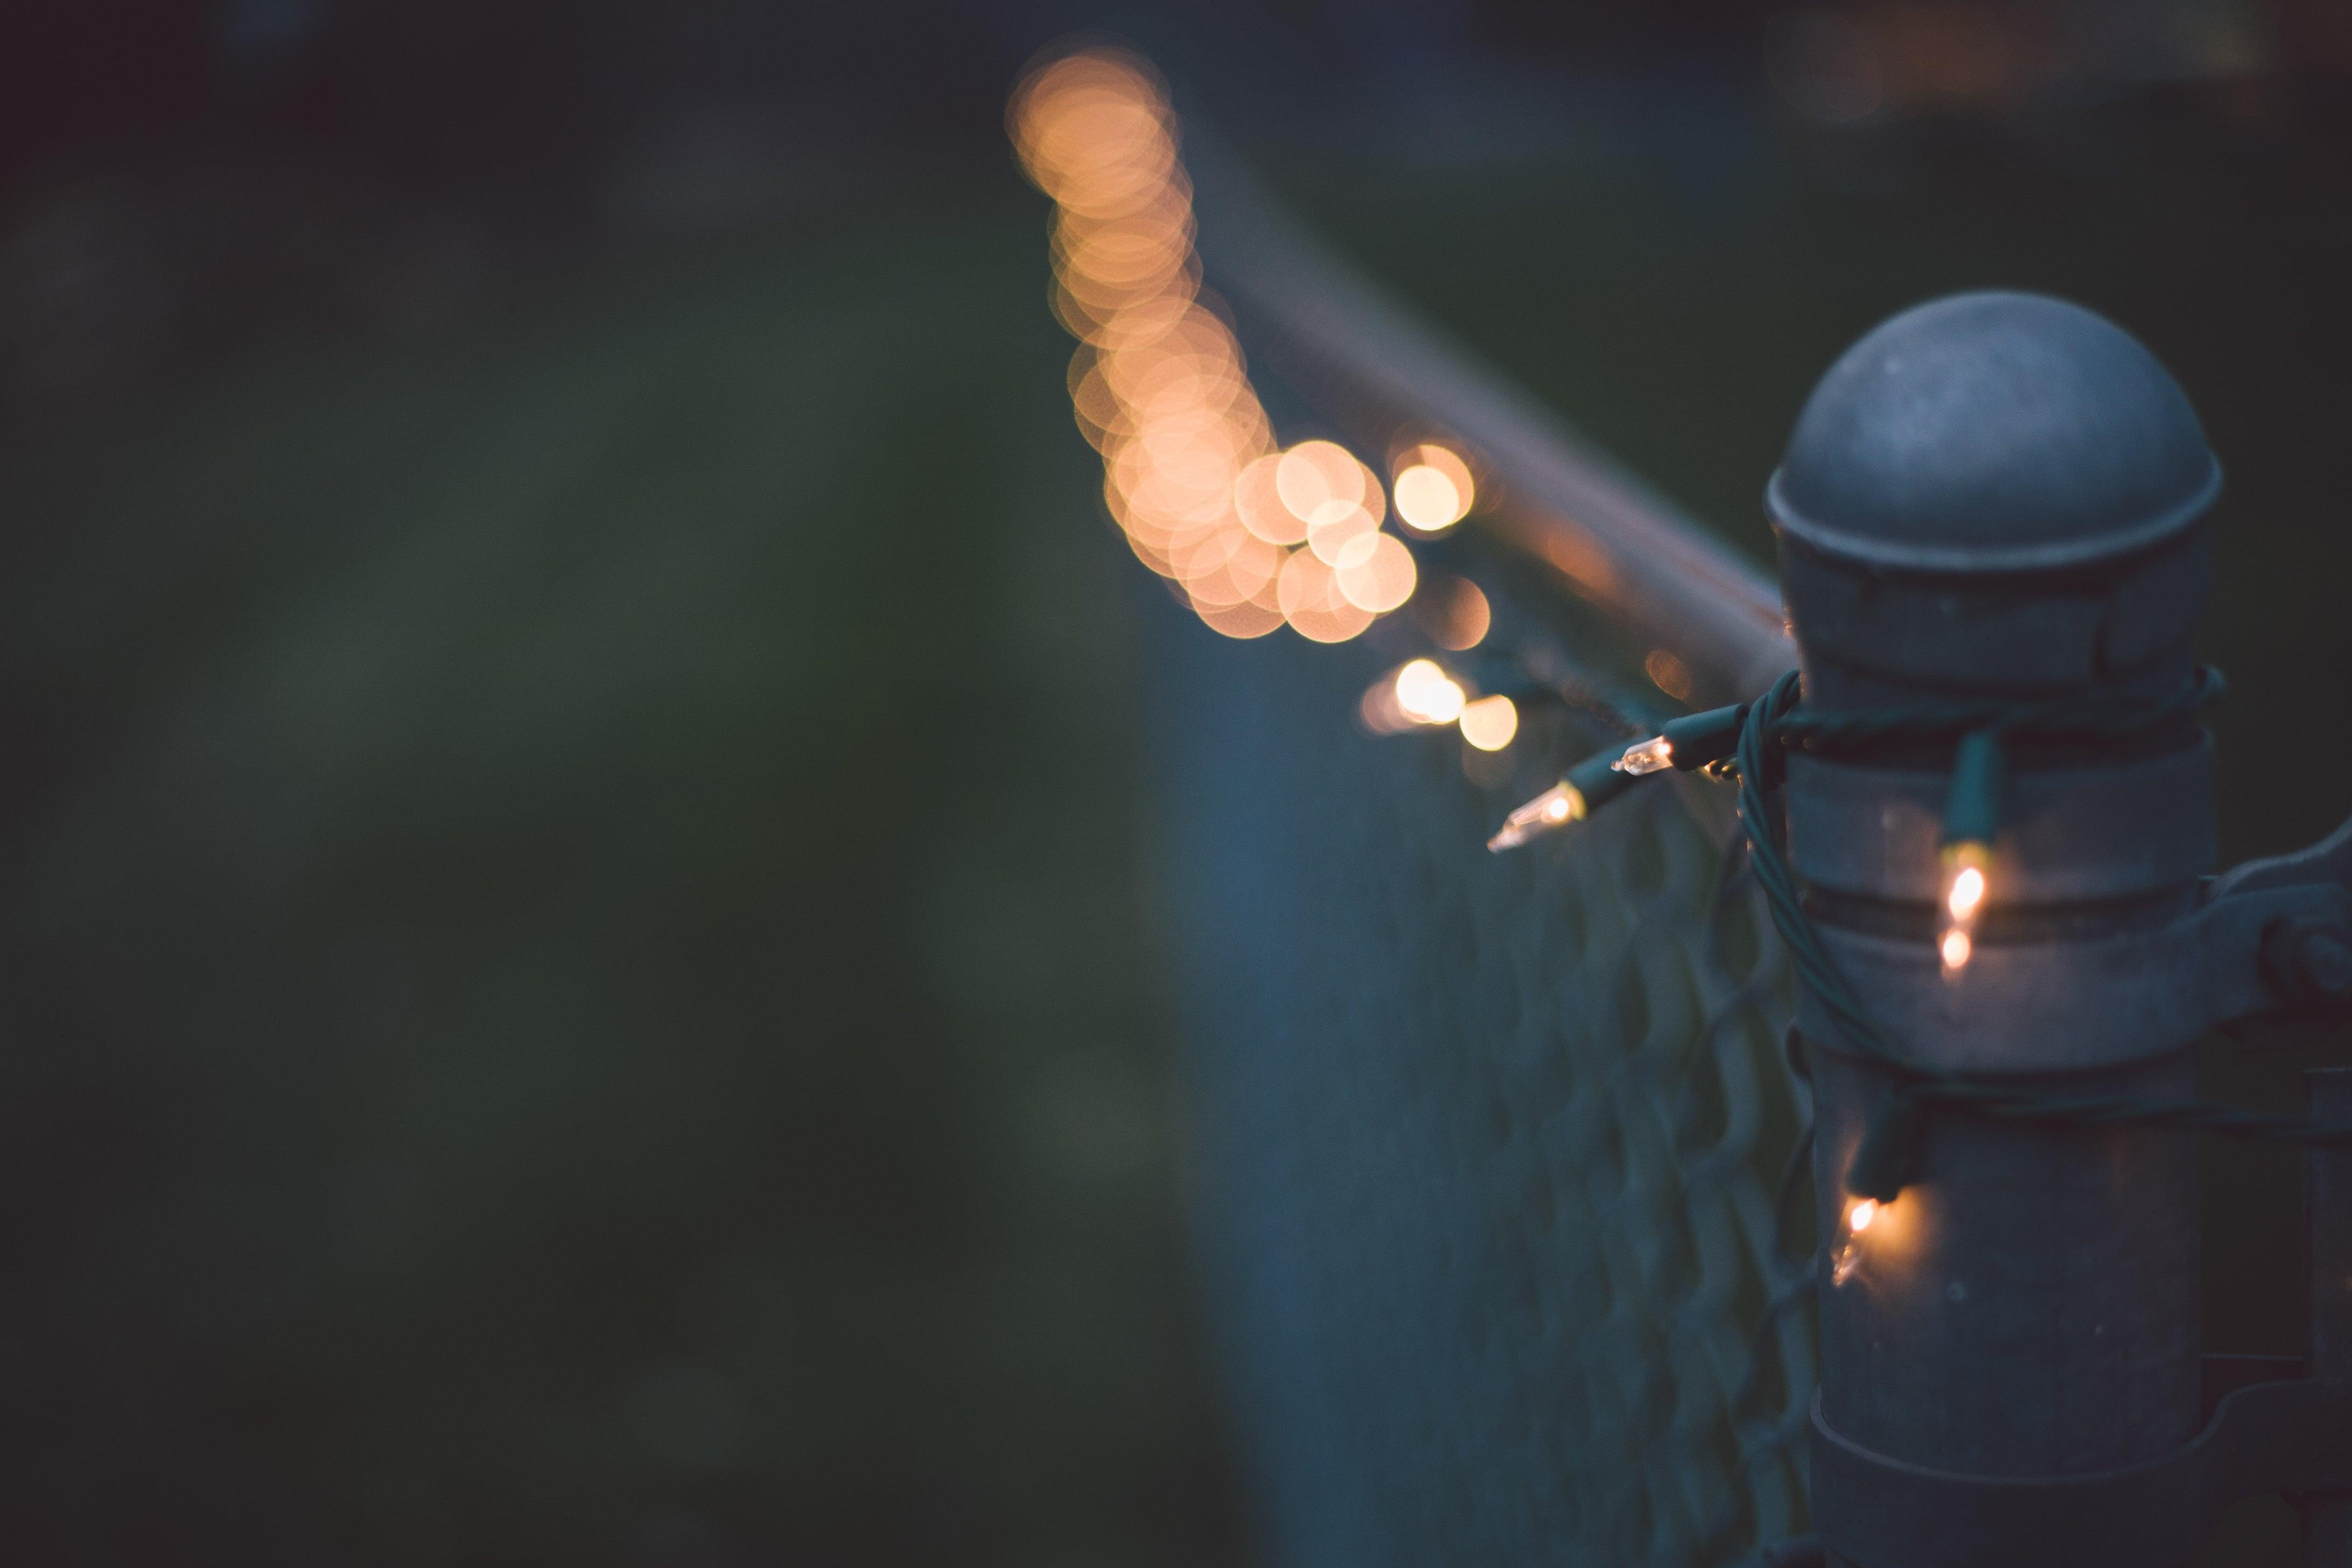 Lichterkette am Zaun